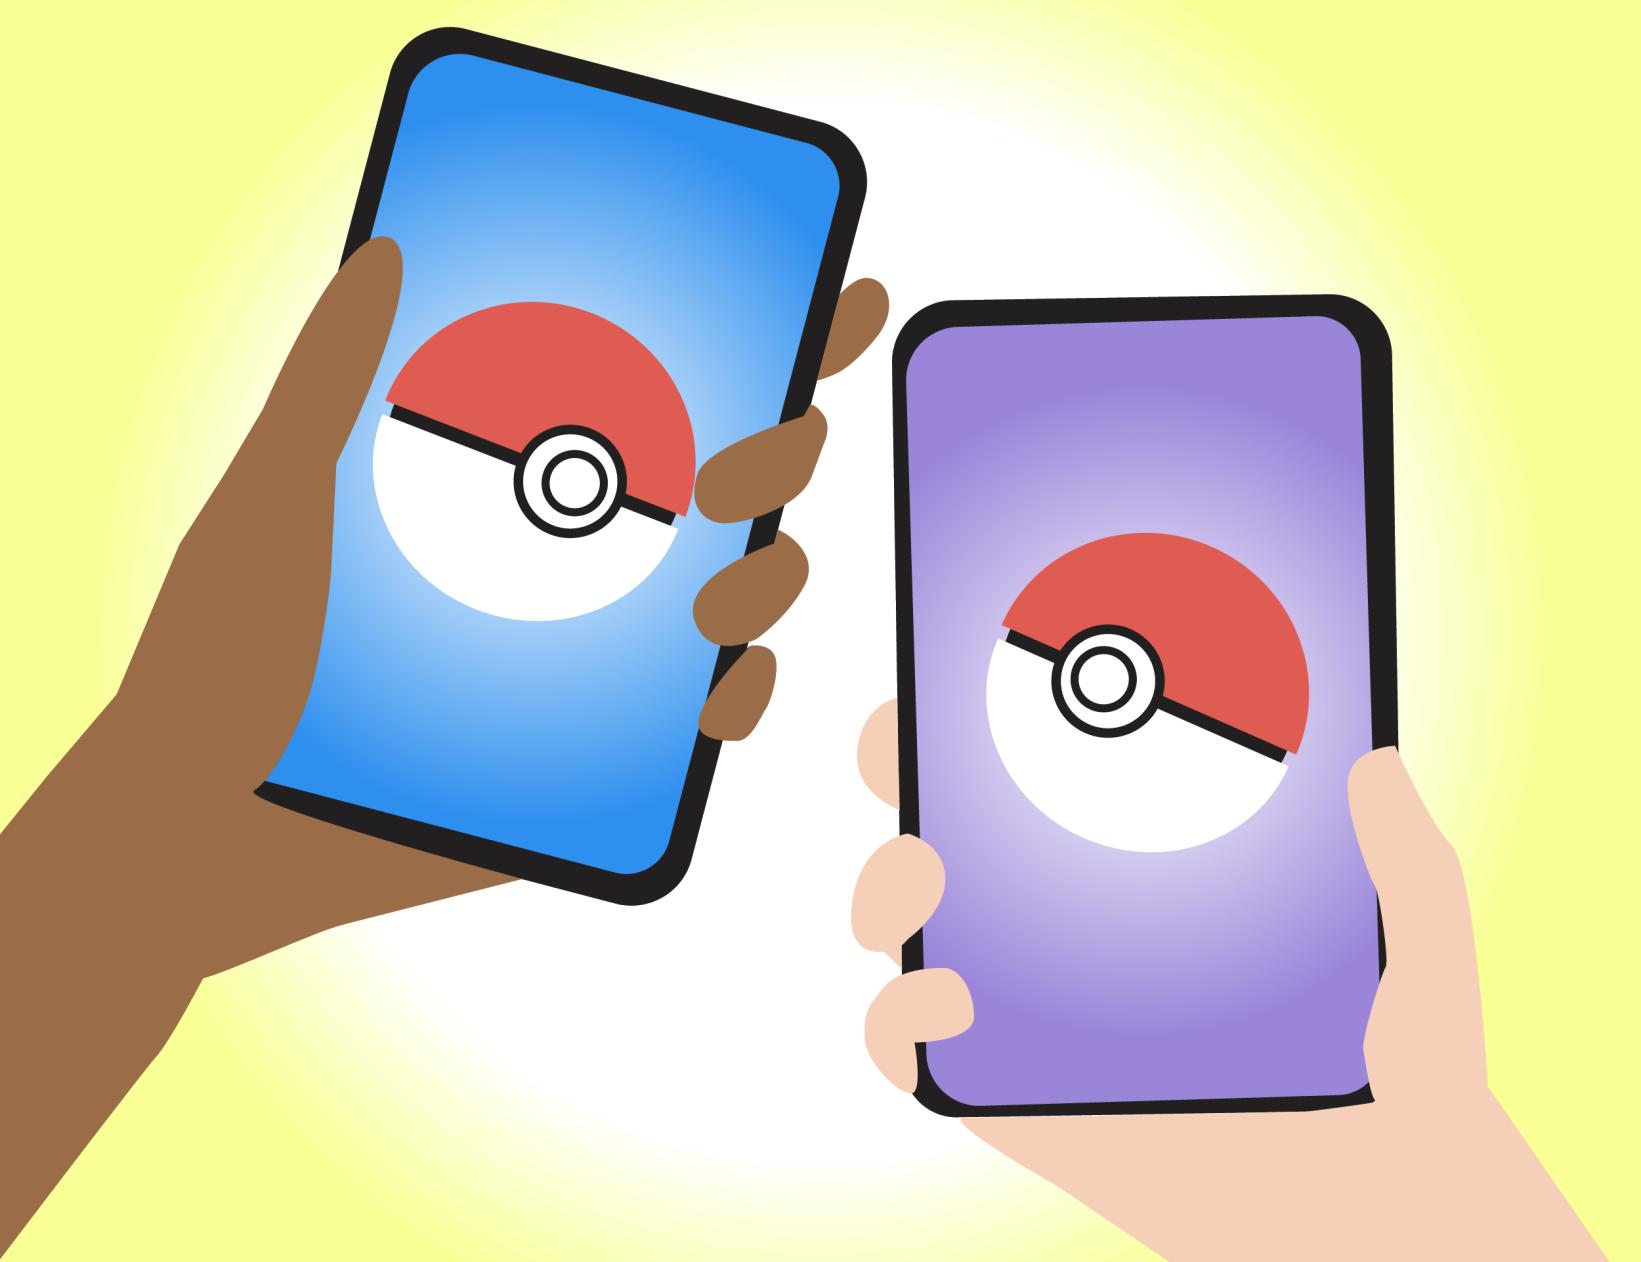 Community: Pokémon Go helps people combat social anxiety, create local communities